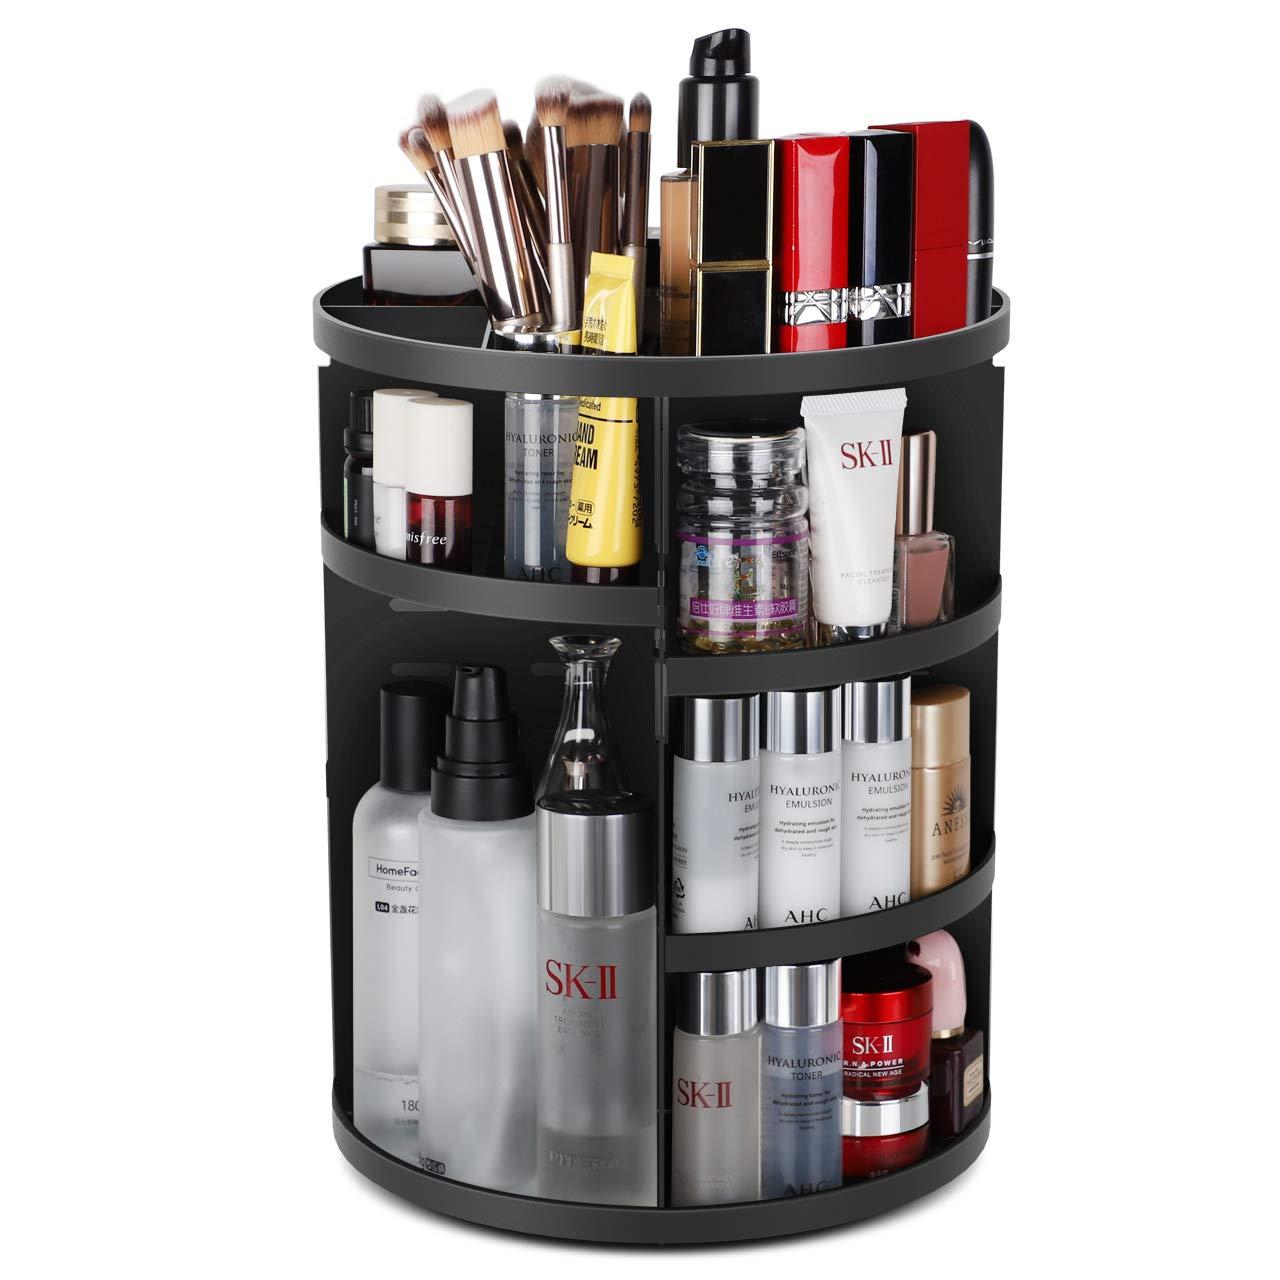 Syntus 360 Rotating Makeup Organizer, DIY Adjustable Bathroom Makeup Carousel Spinning Holder Rack, Large Capacity…